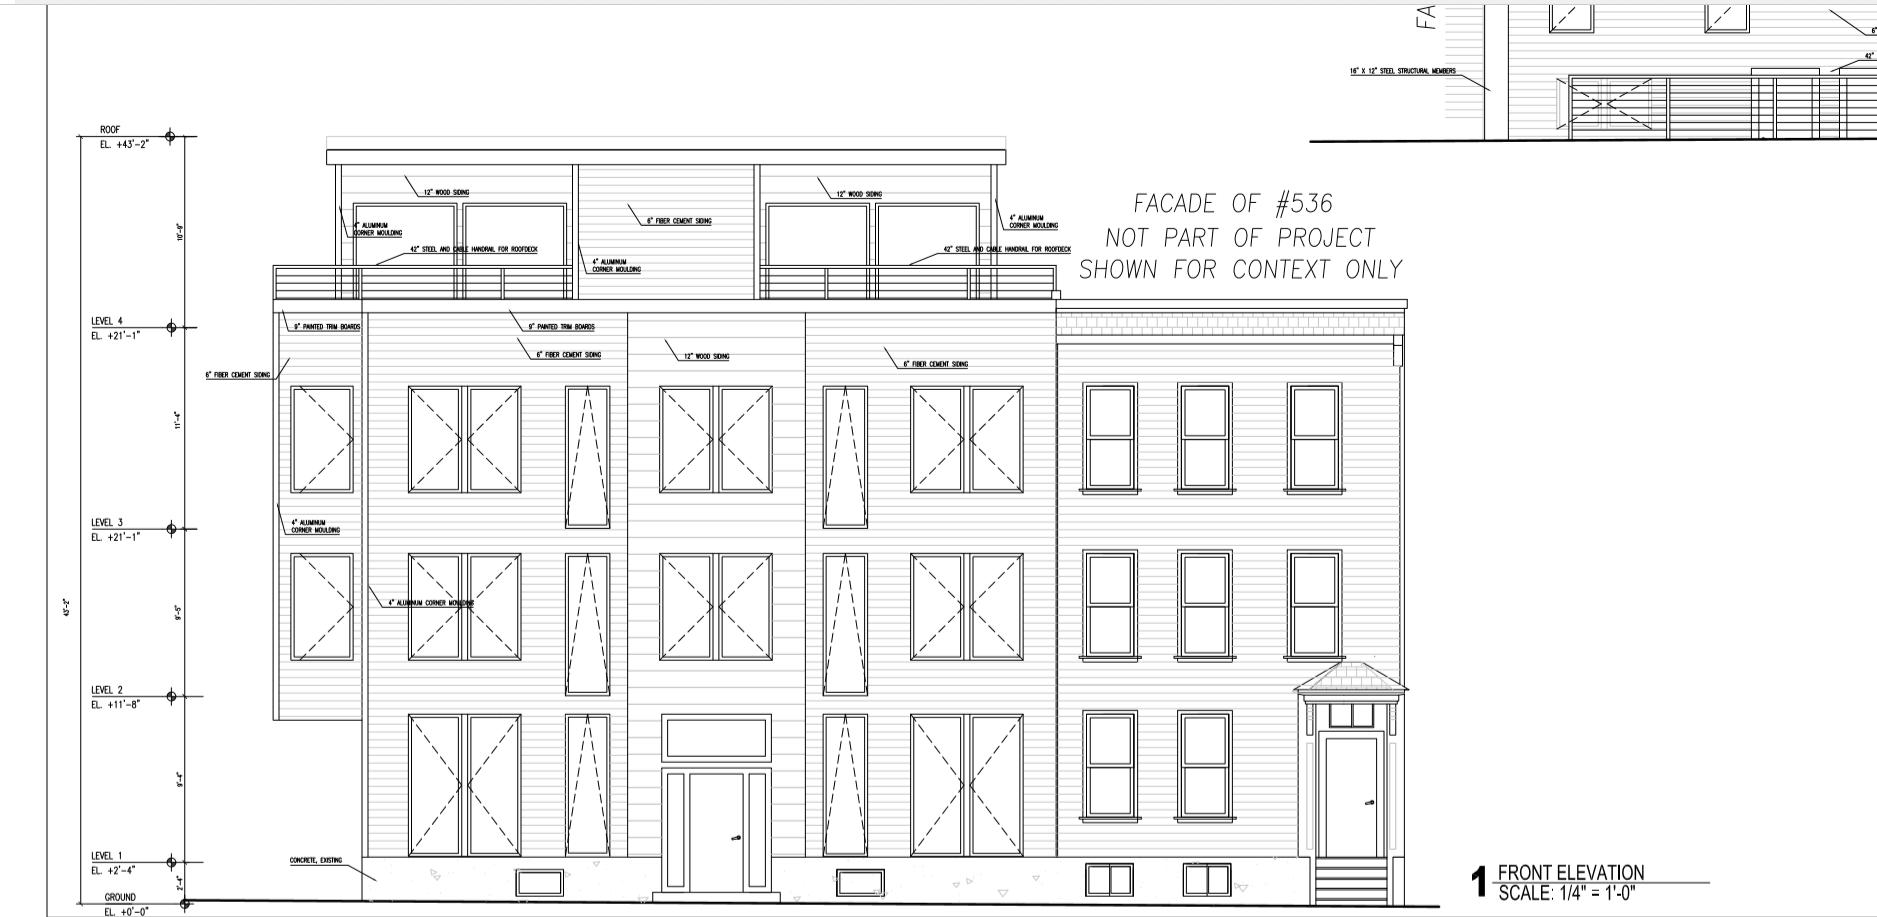 534 R Dorchester Ave Front Elevation